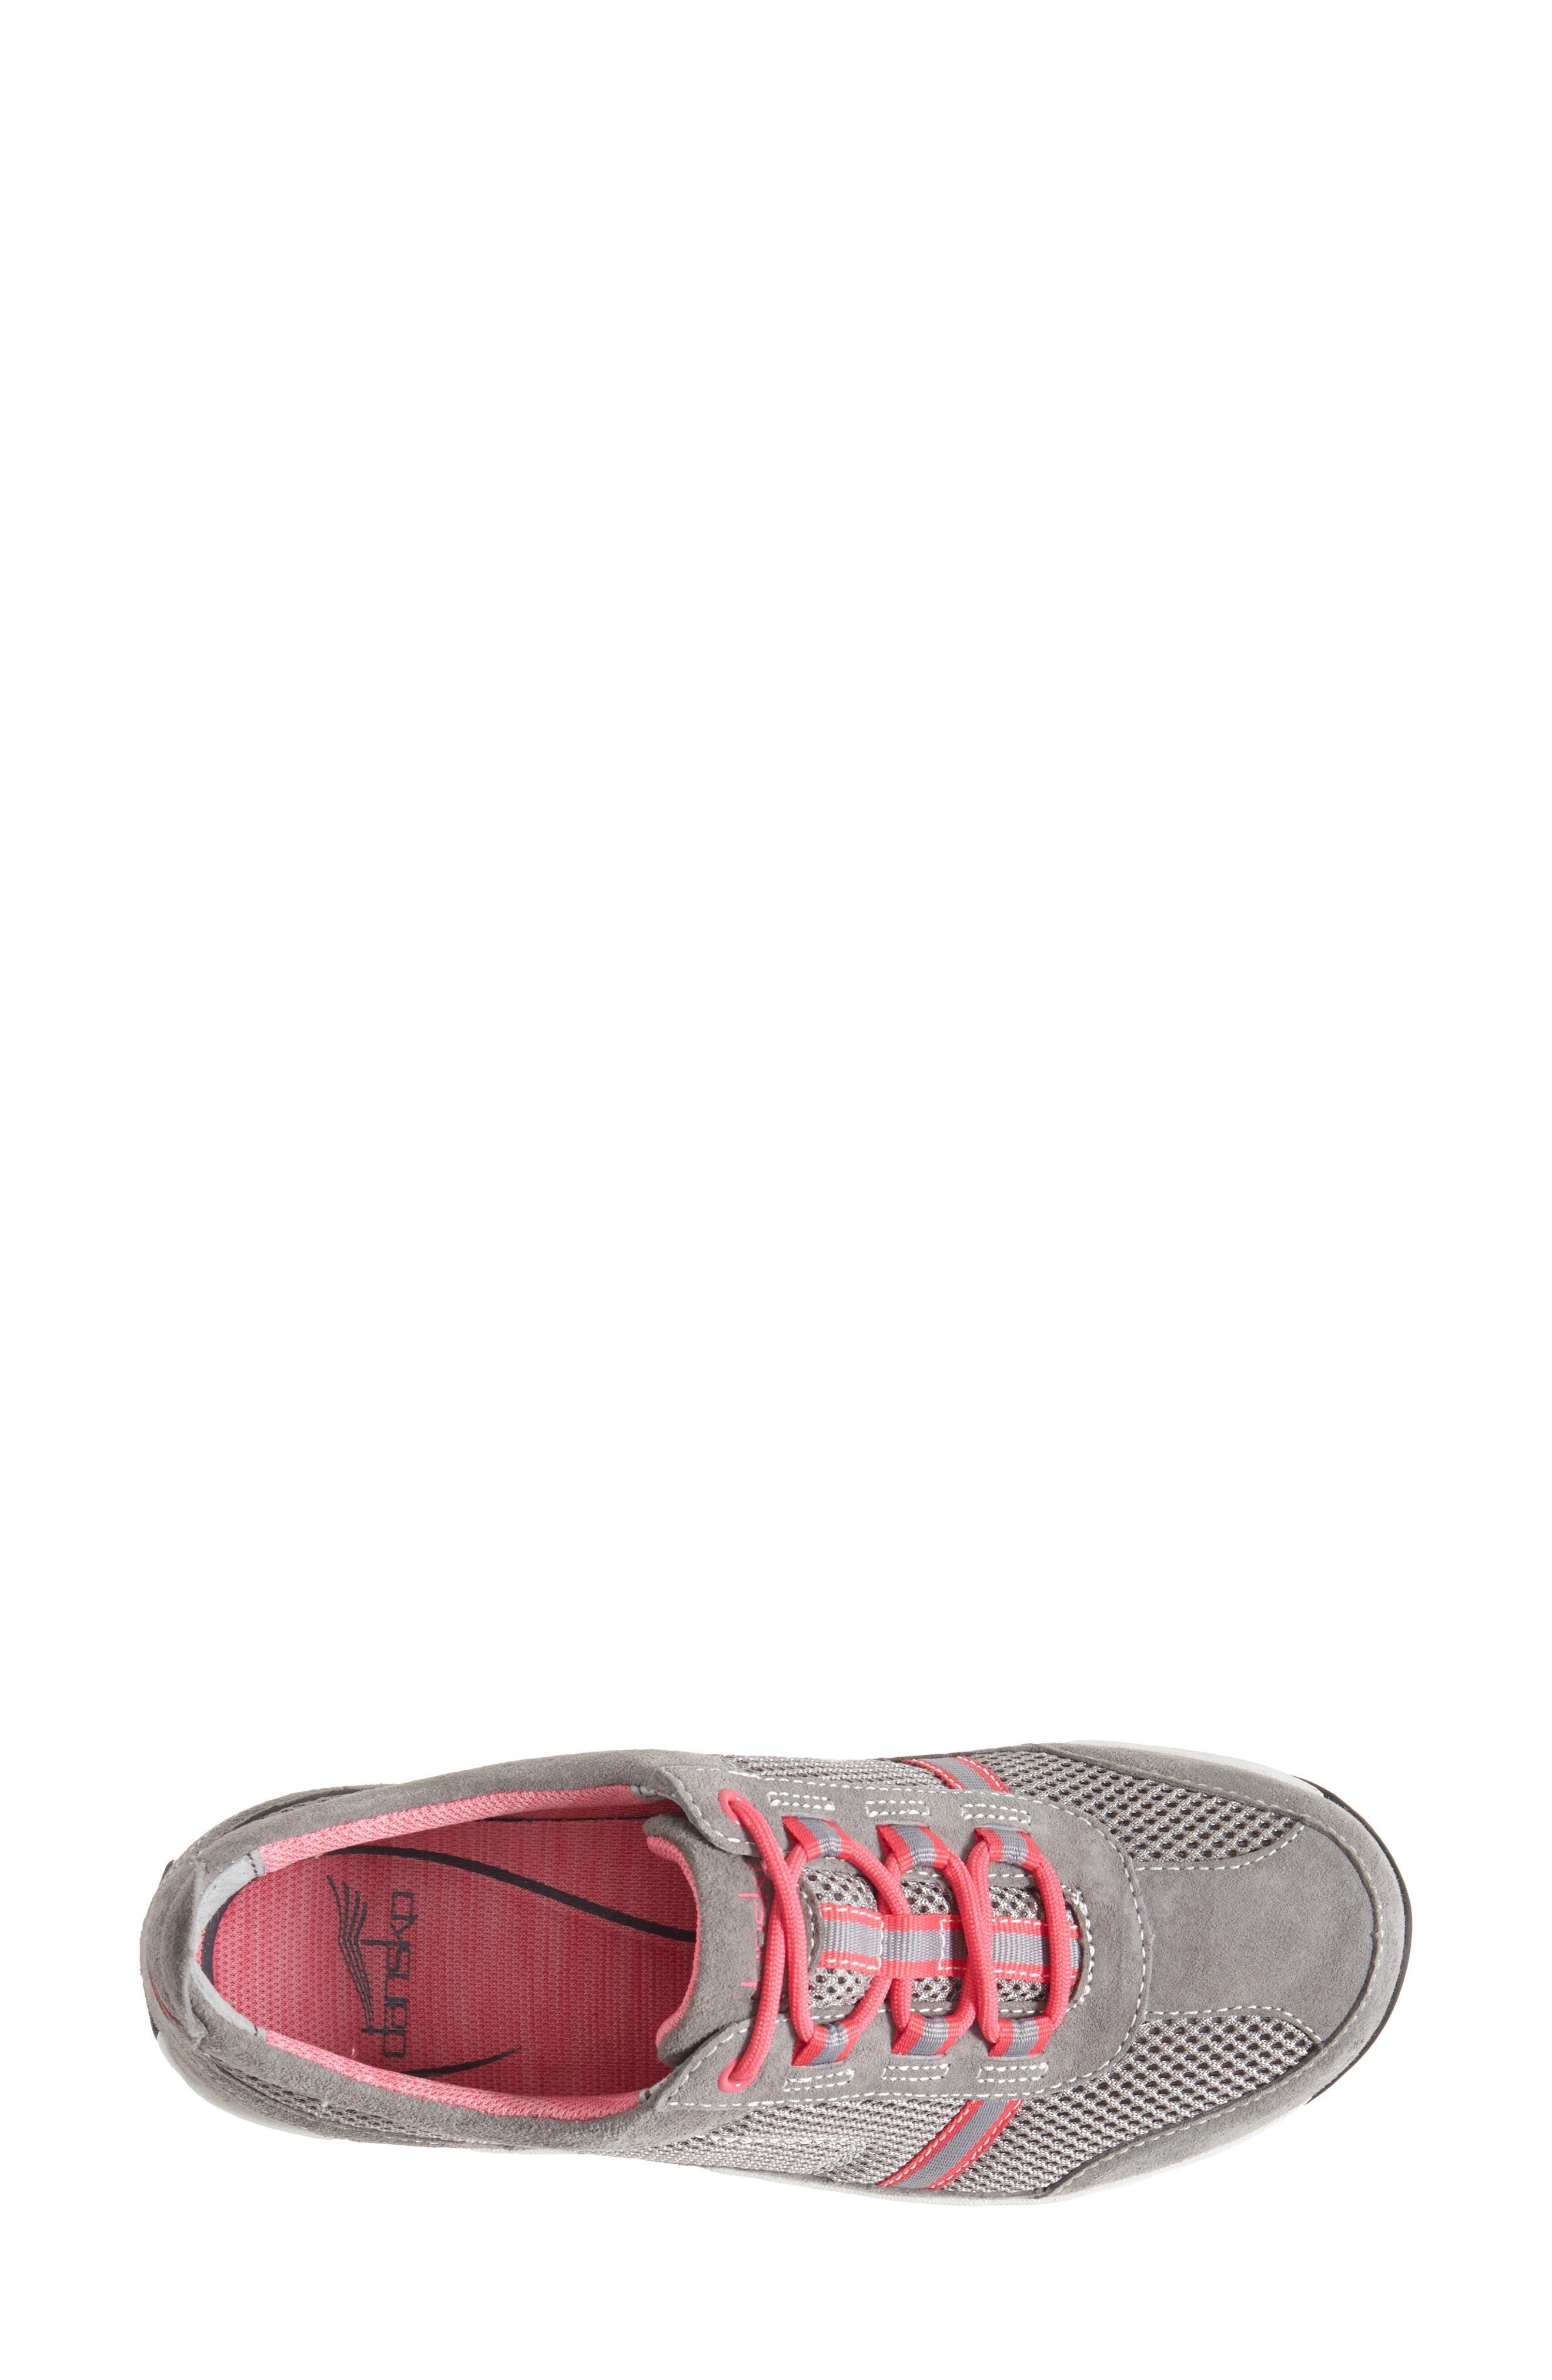 'Helen' Suede & Mesh Sneaker,                             Alternate thumbnail 20, color,